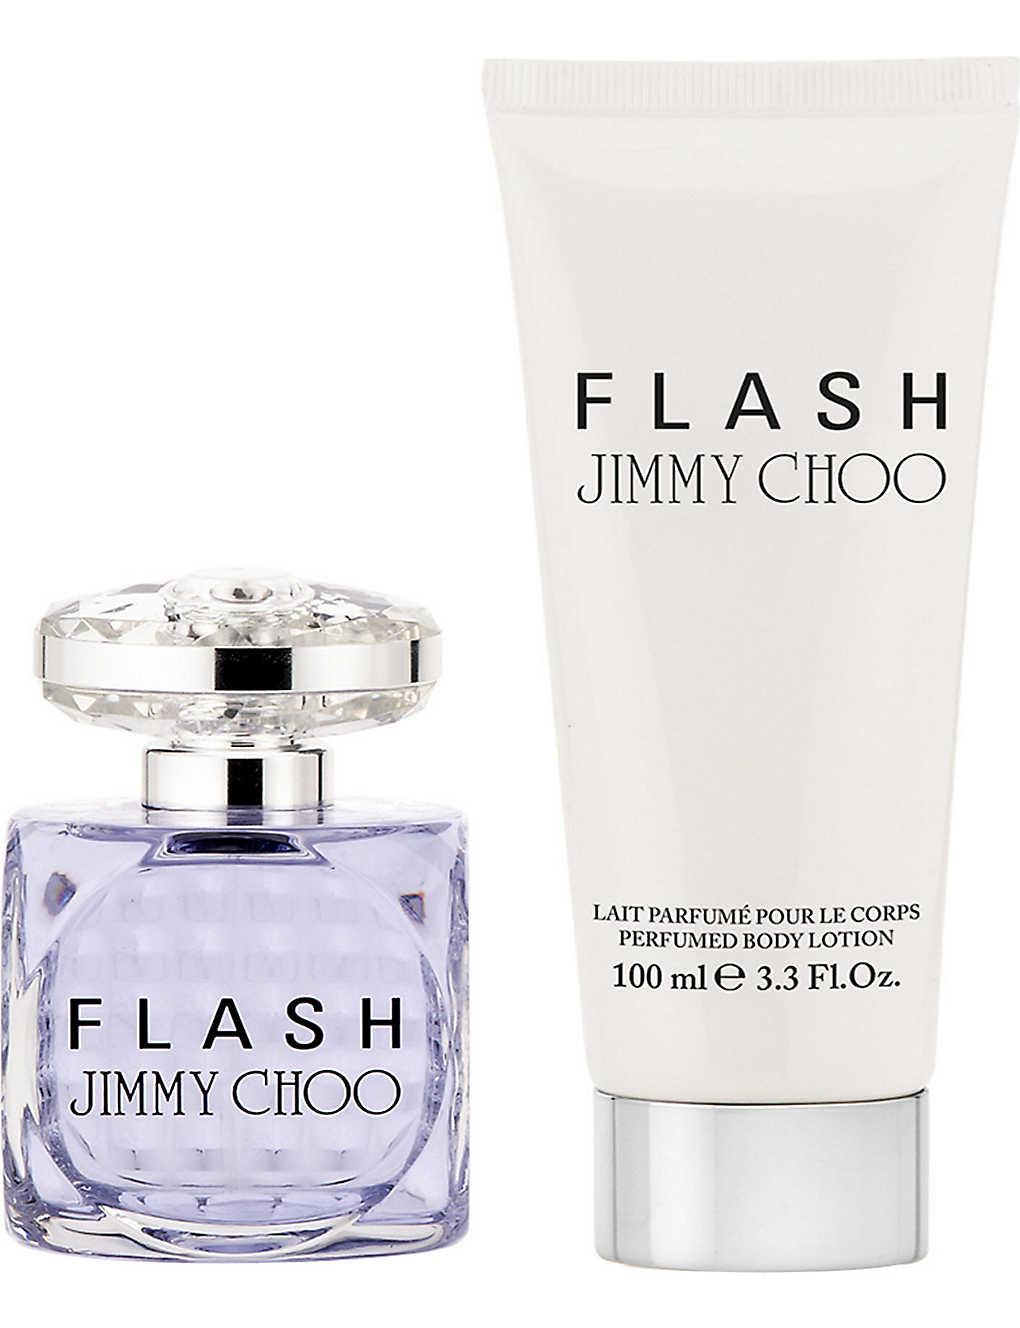 Choo Jimmy De 60ml Flash Parfum Set Eau Gift CxtBsQorhd